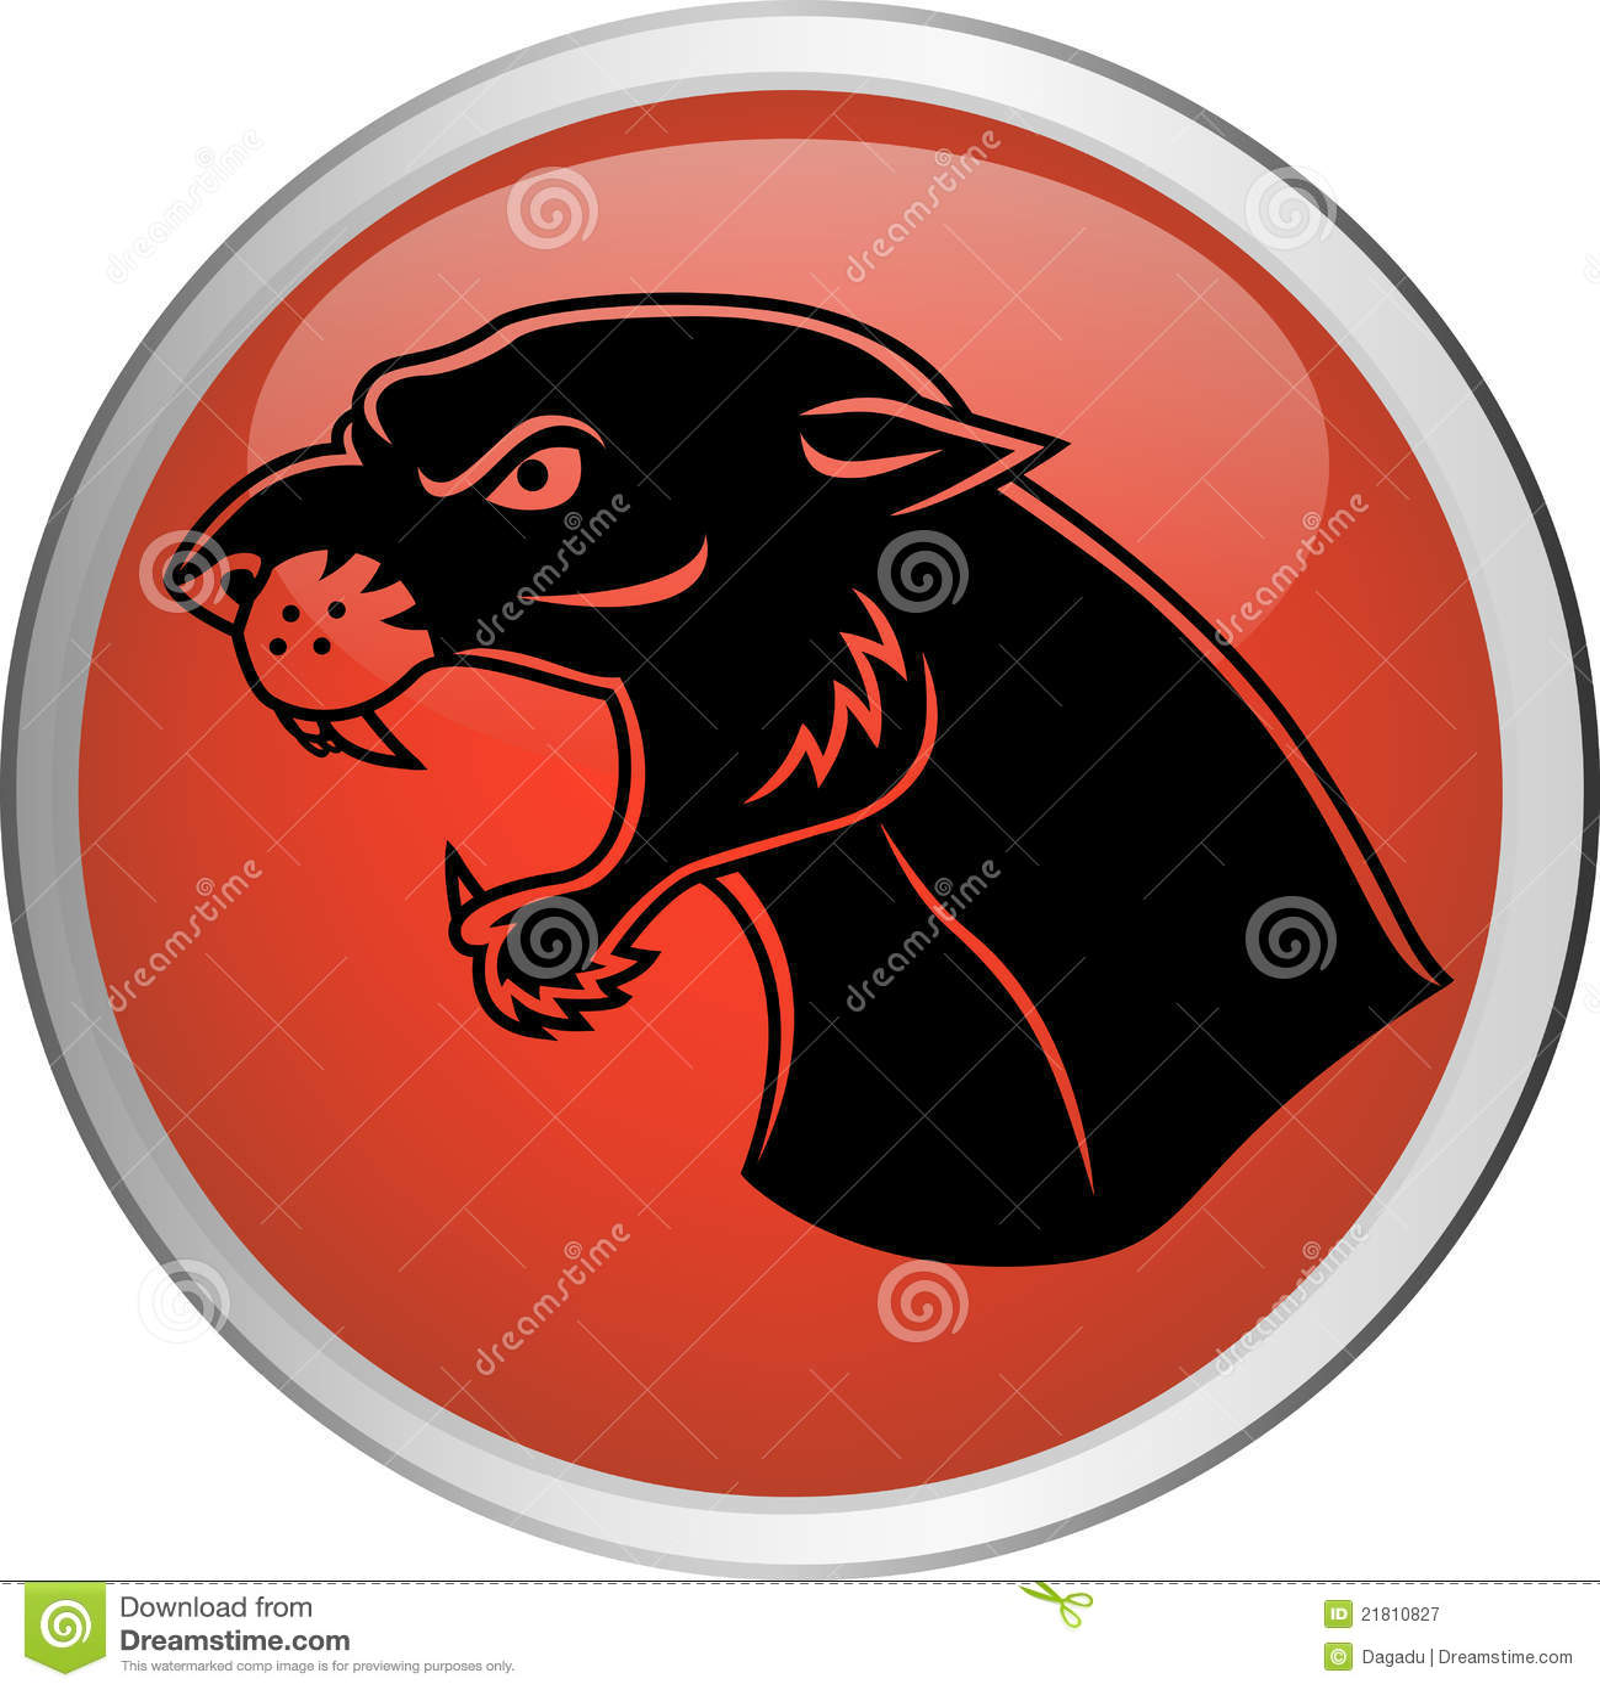 panther da capo spielautomat